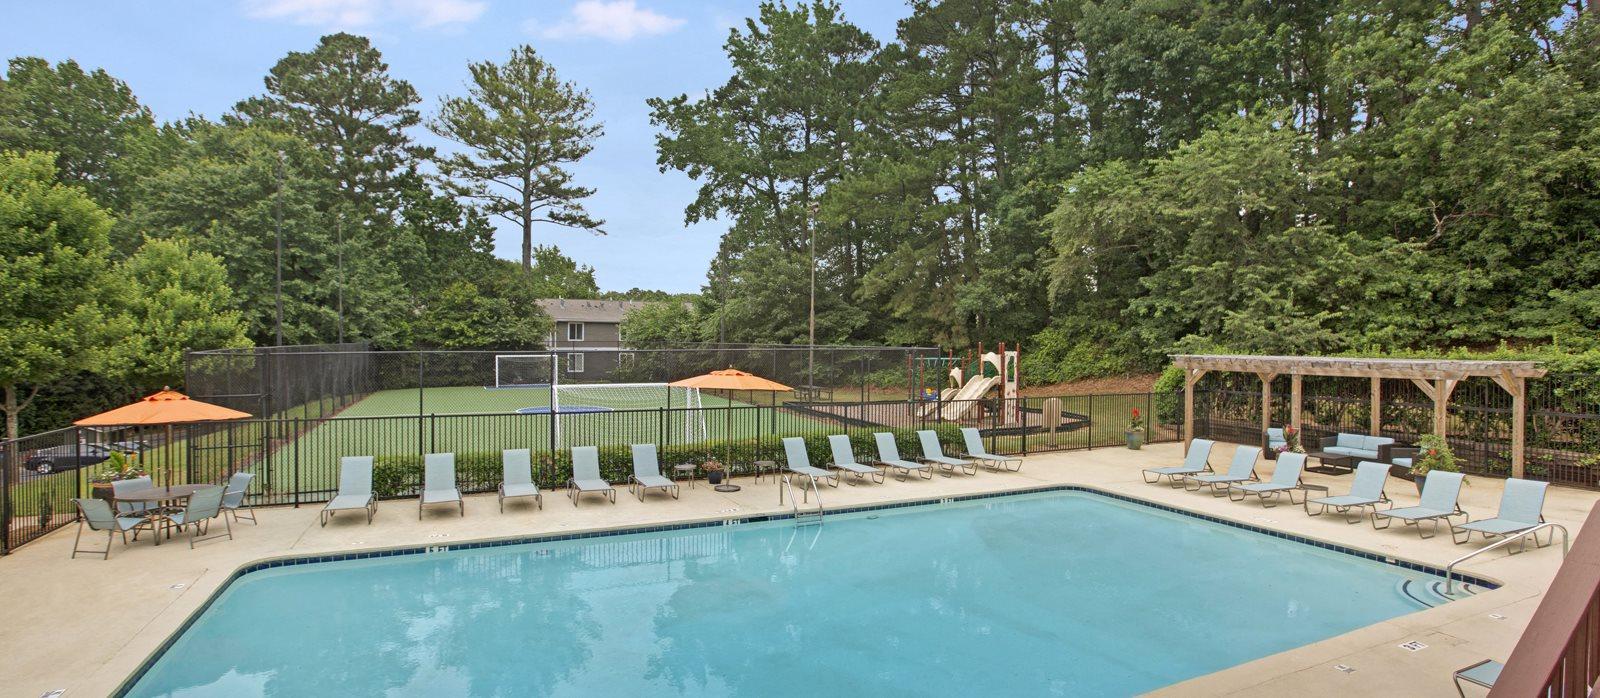 Lacota Apartment Homes | Apartments in Atlanta, GA